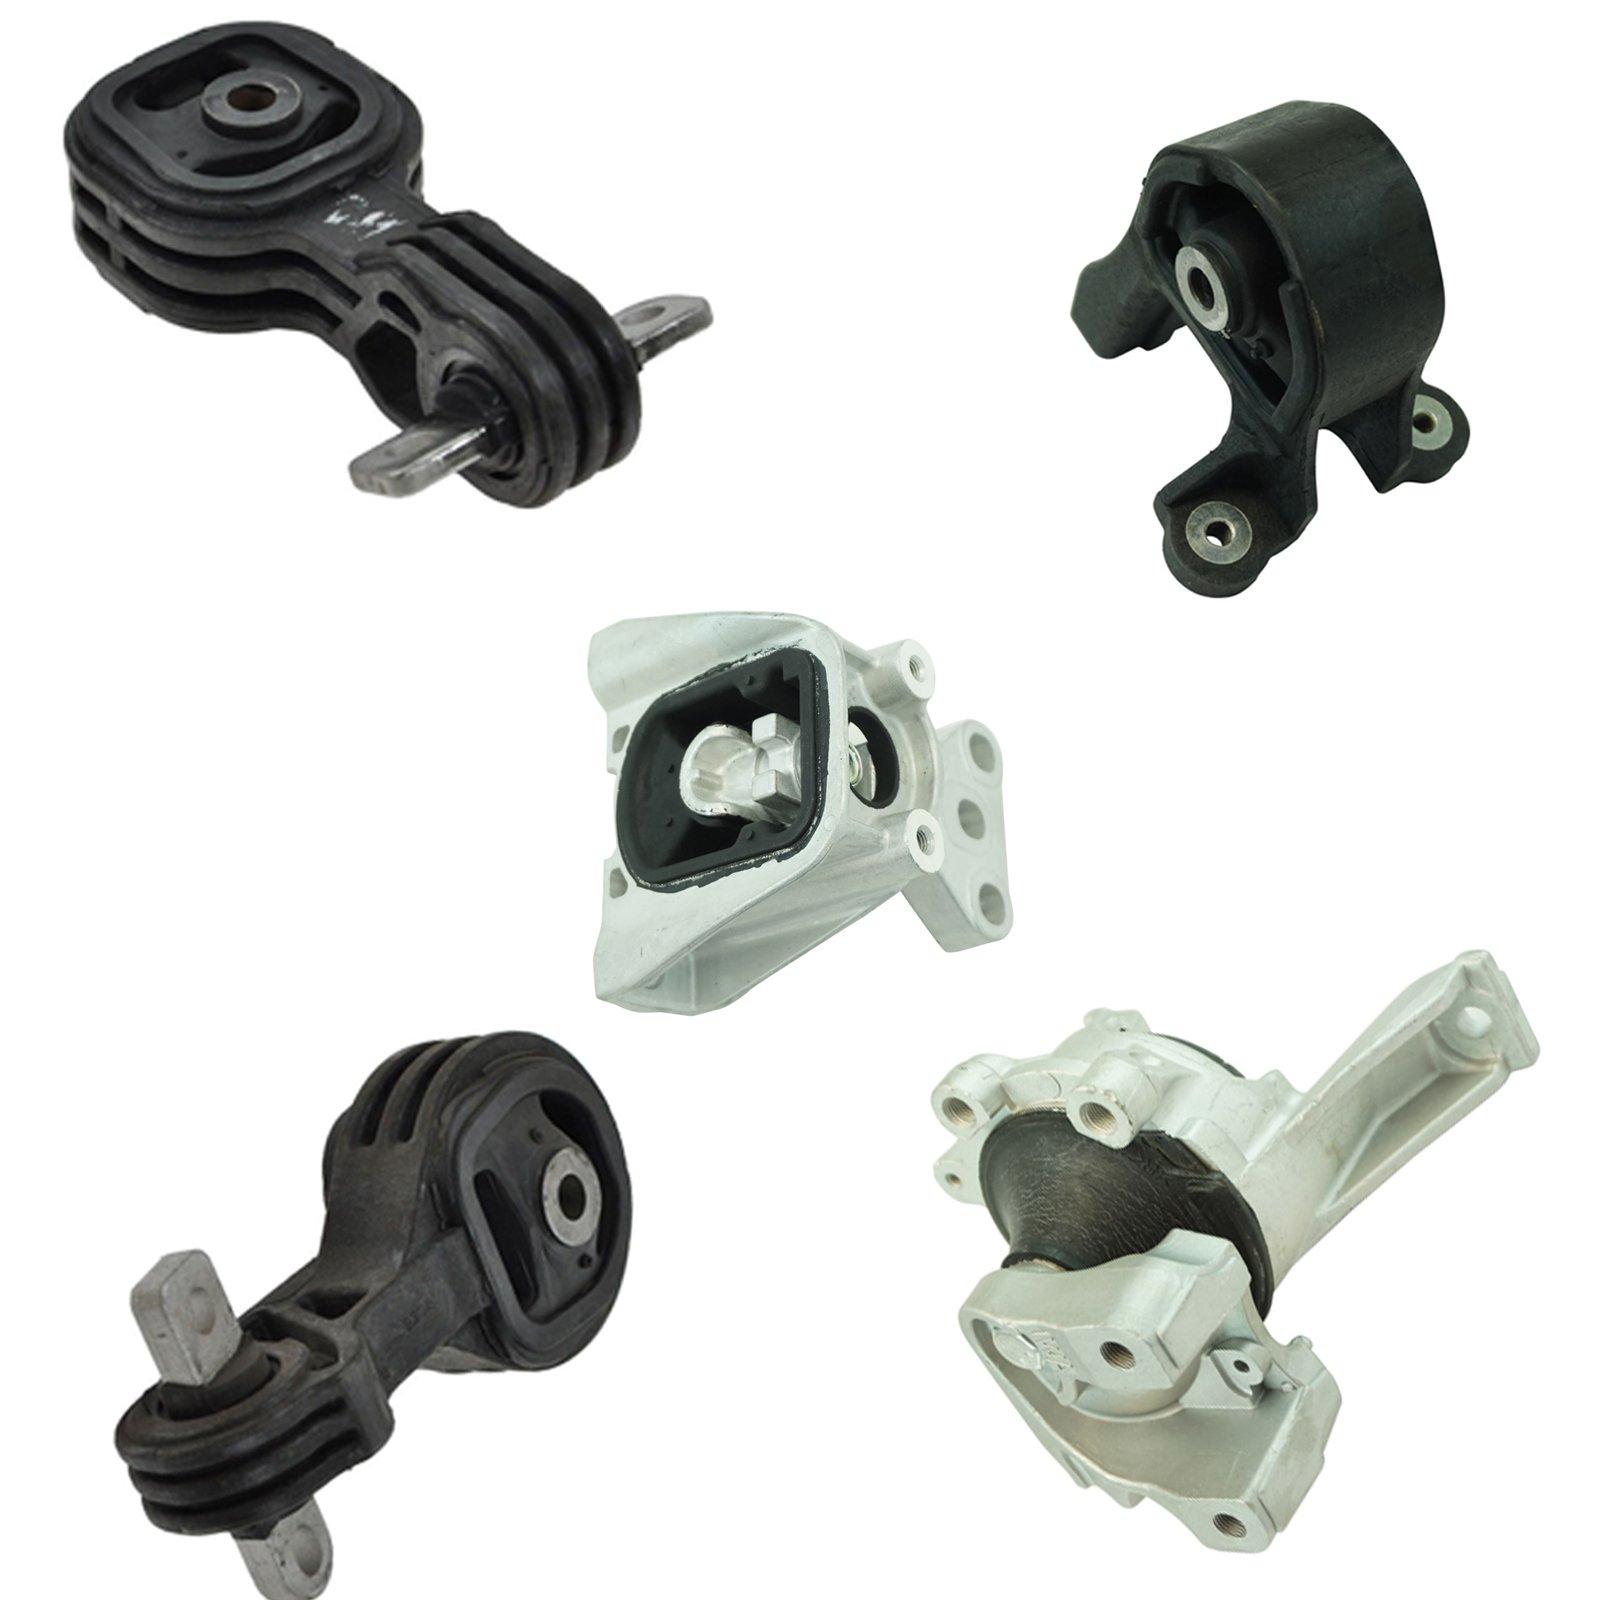 5 Piece Engine & Transmission Motor Mount Kit Set for Honda CR-V SUV Brand by 1A Auto